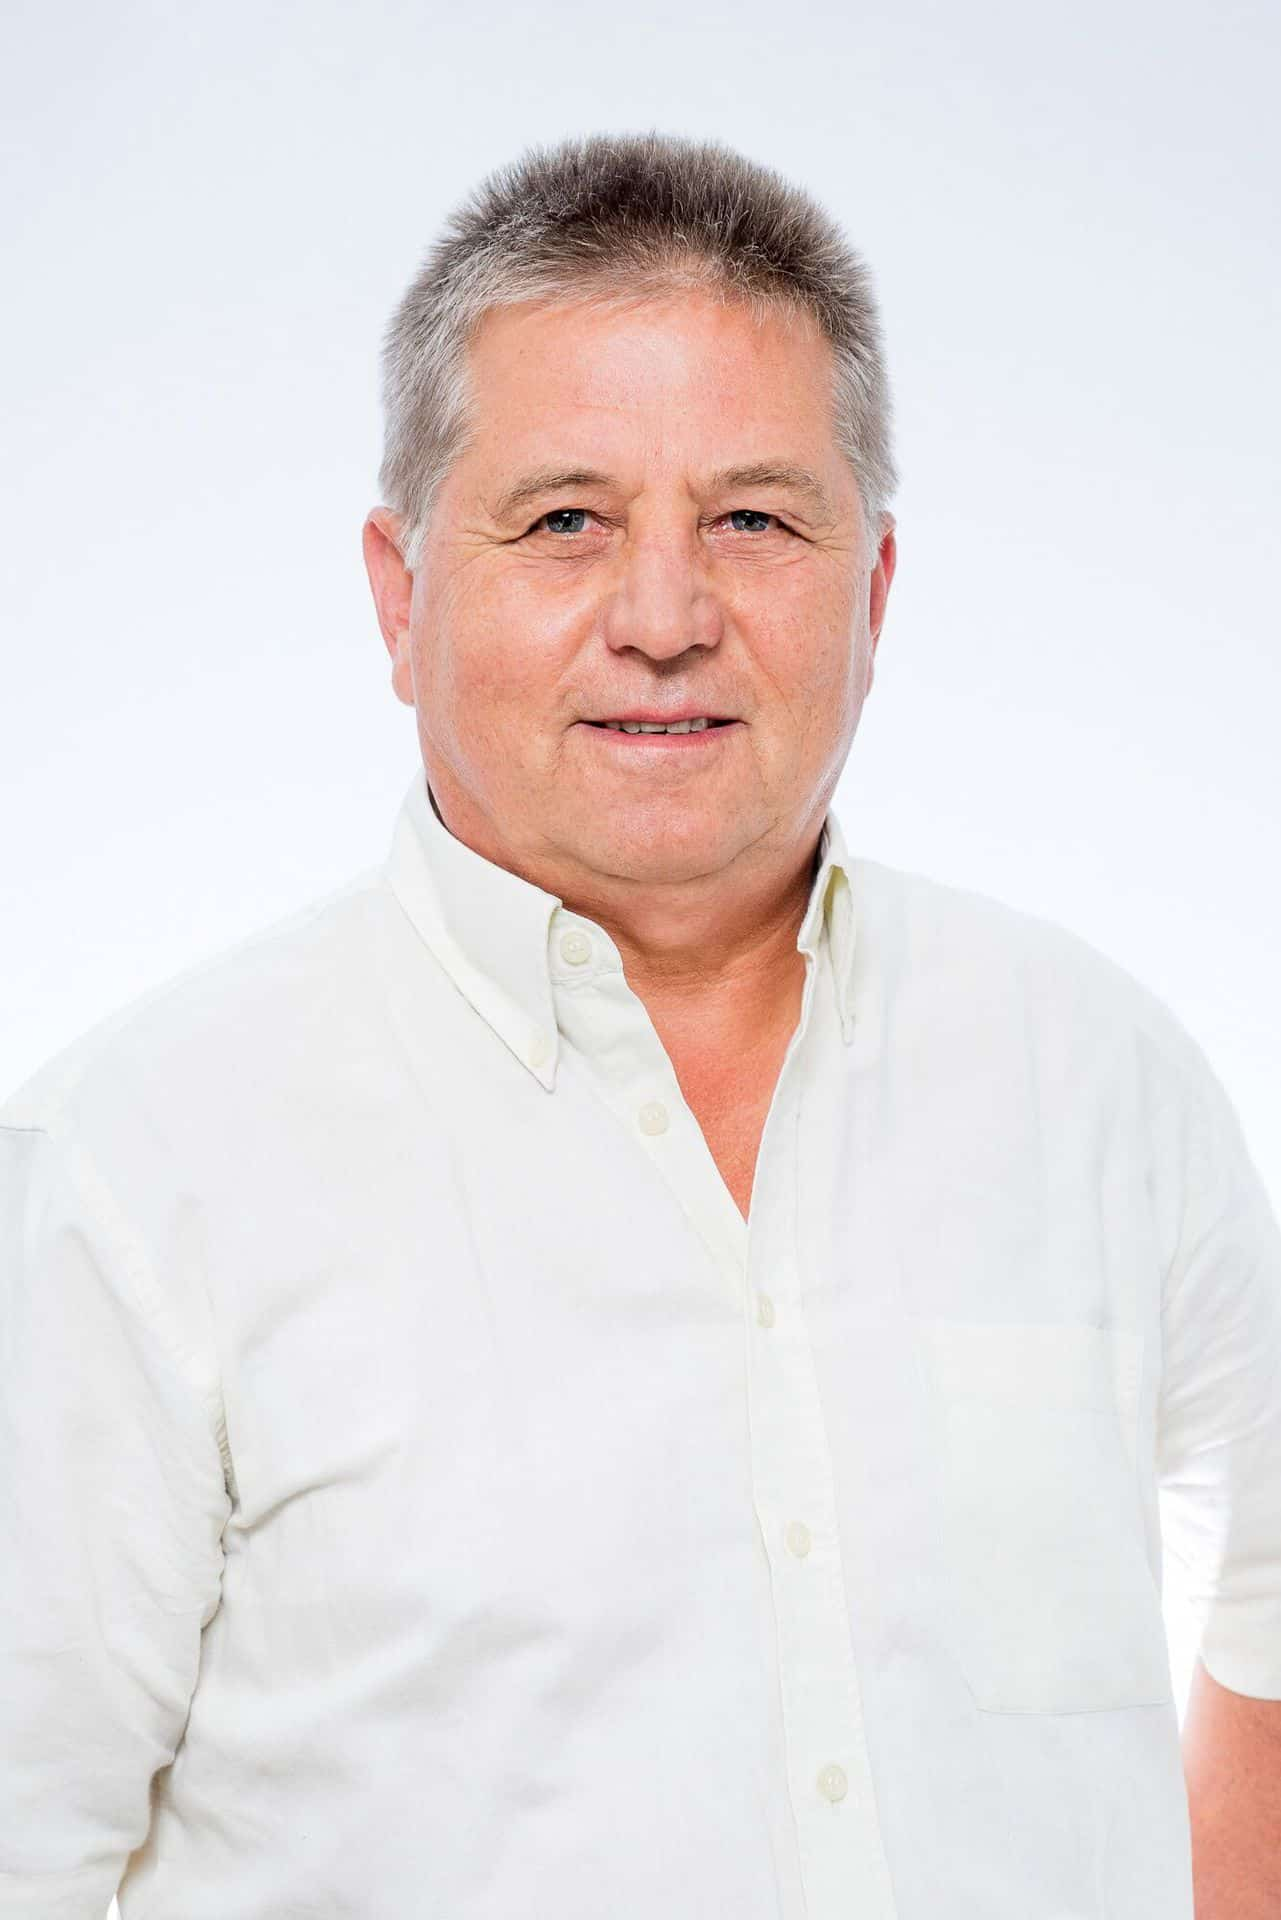 Johann Oberholzer